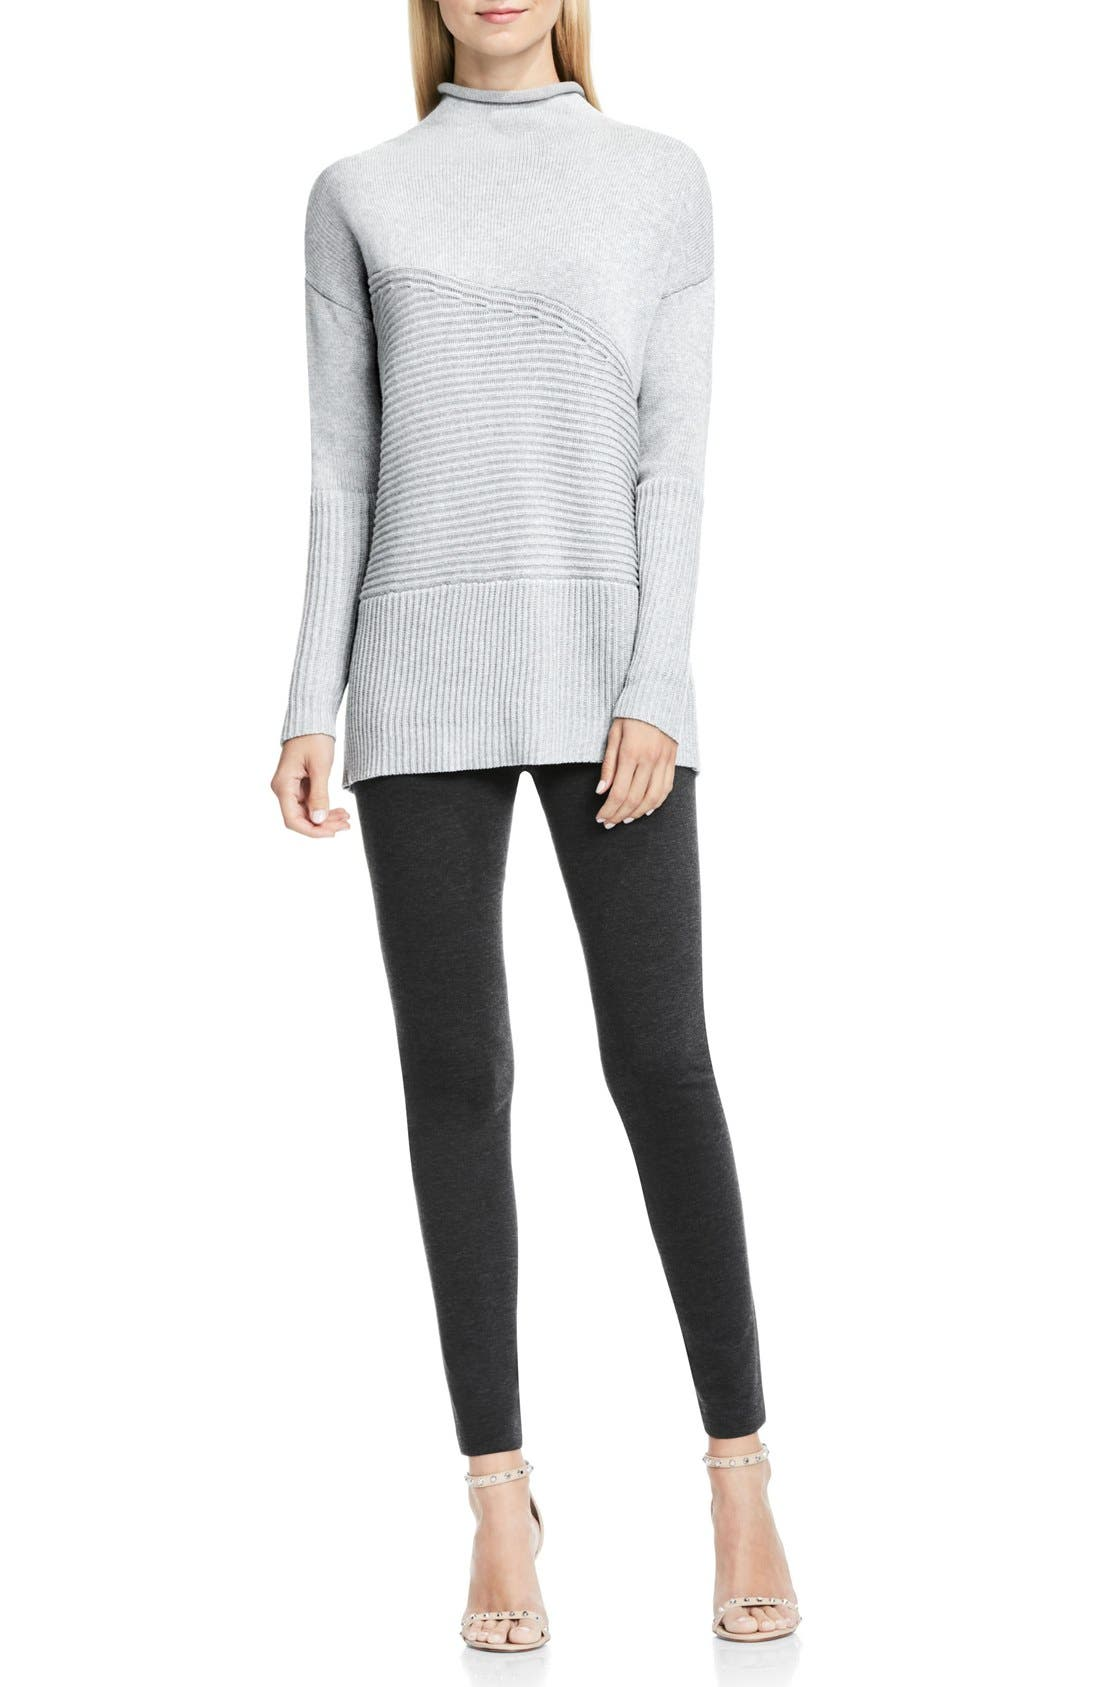 Alternate Image 2  - Vince Camuto Rib Knit Turtleneck Sweater (Regular & Petite)